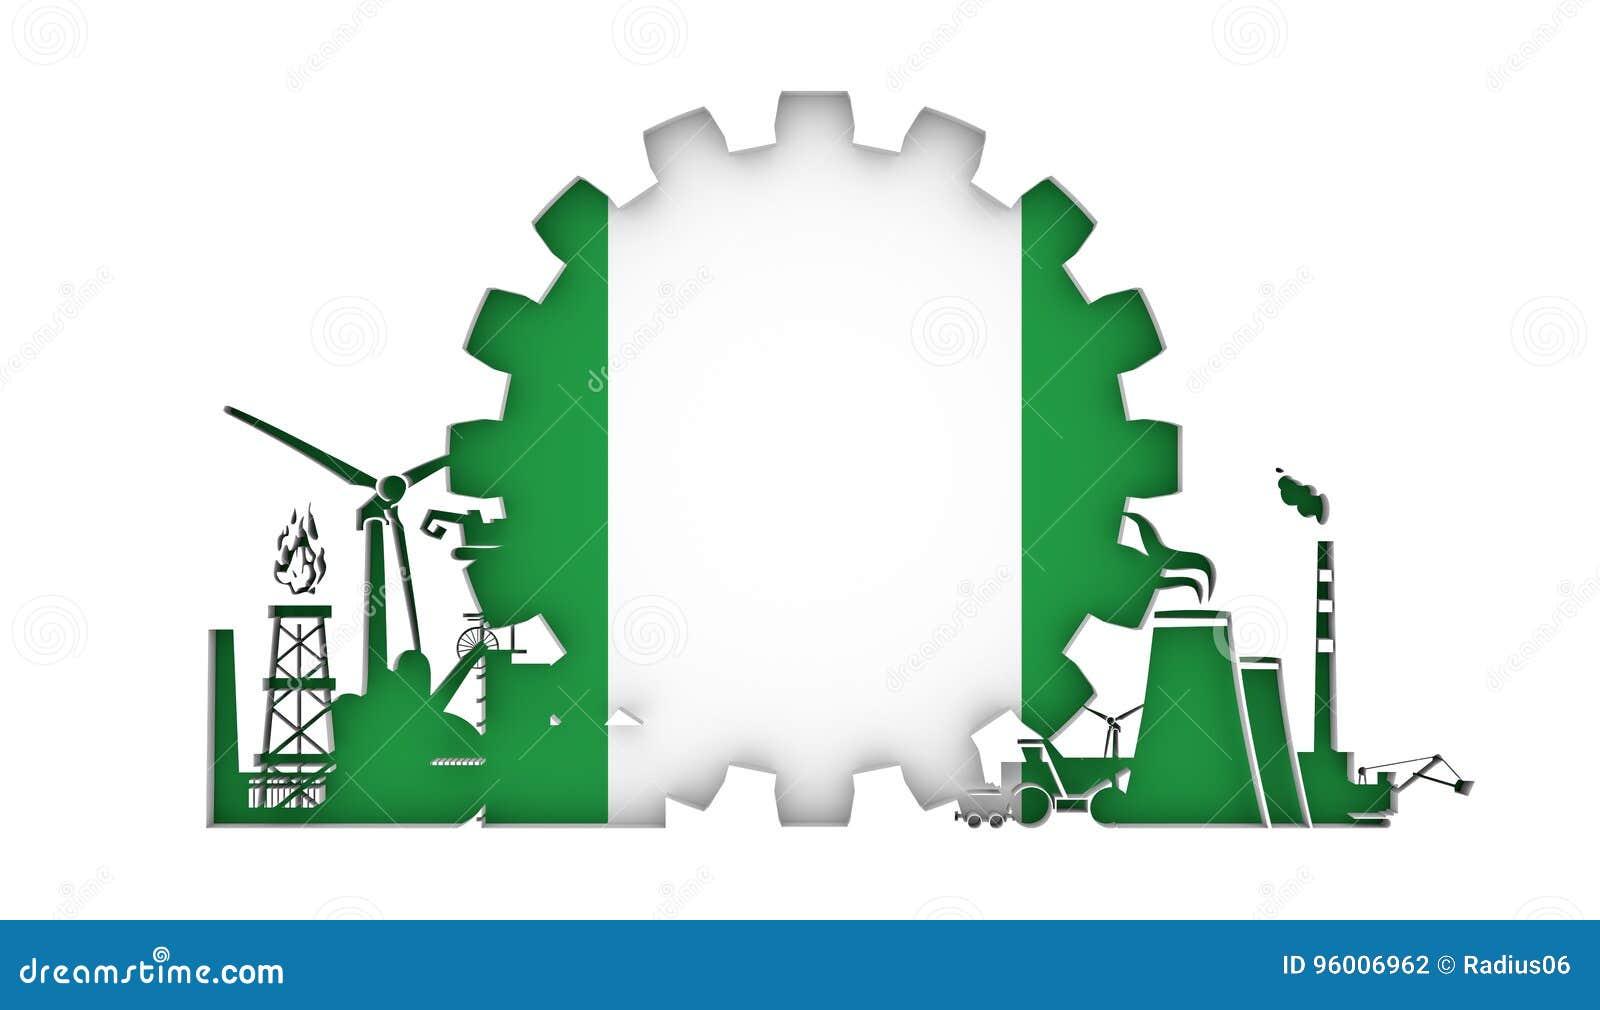 Industrialization and employment generation in nigeria